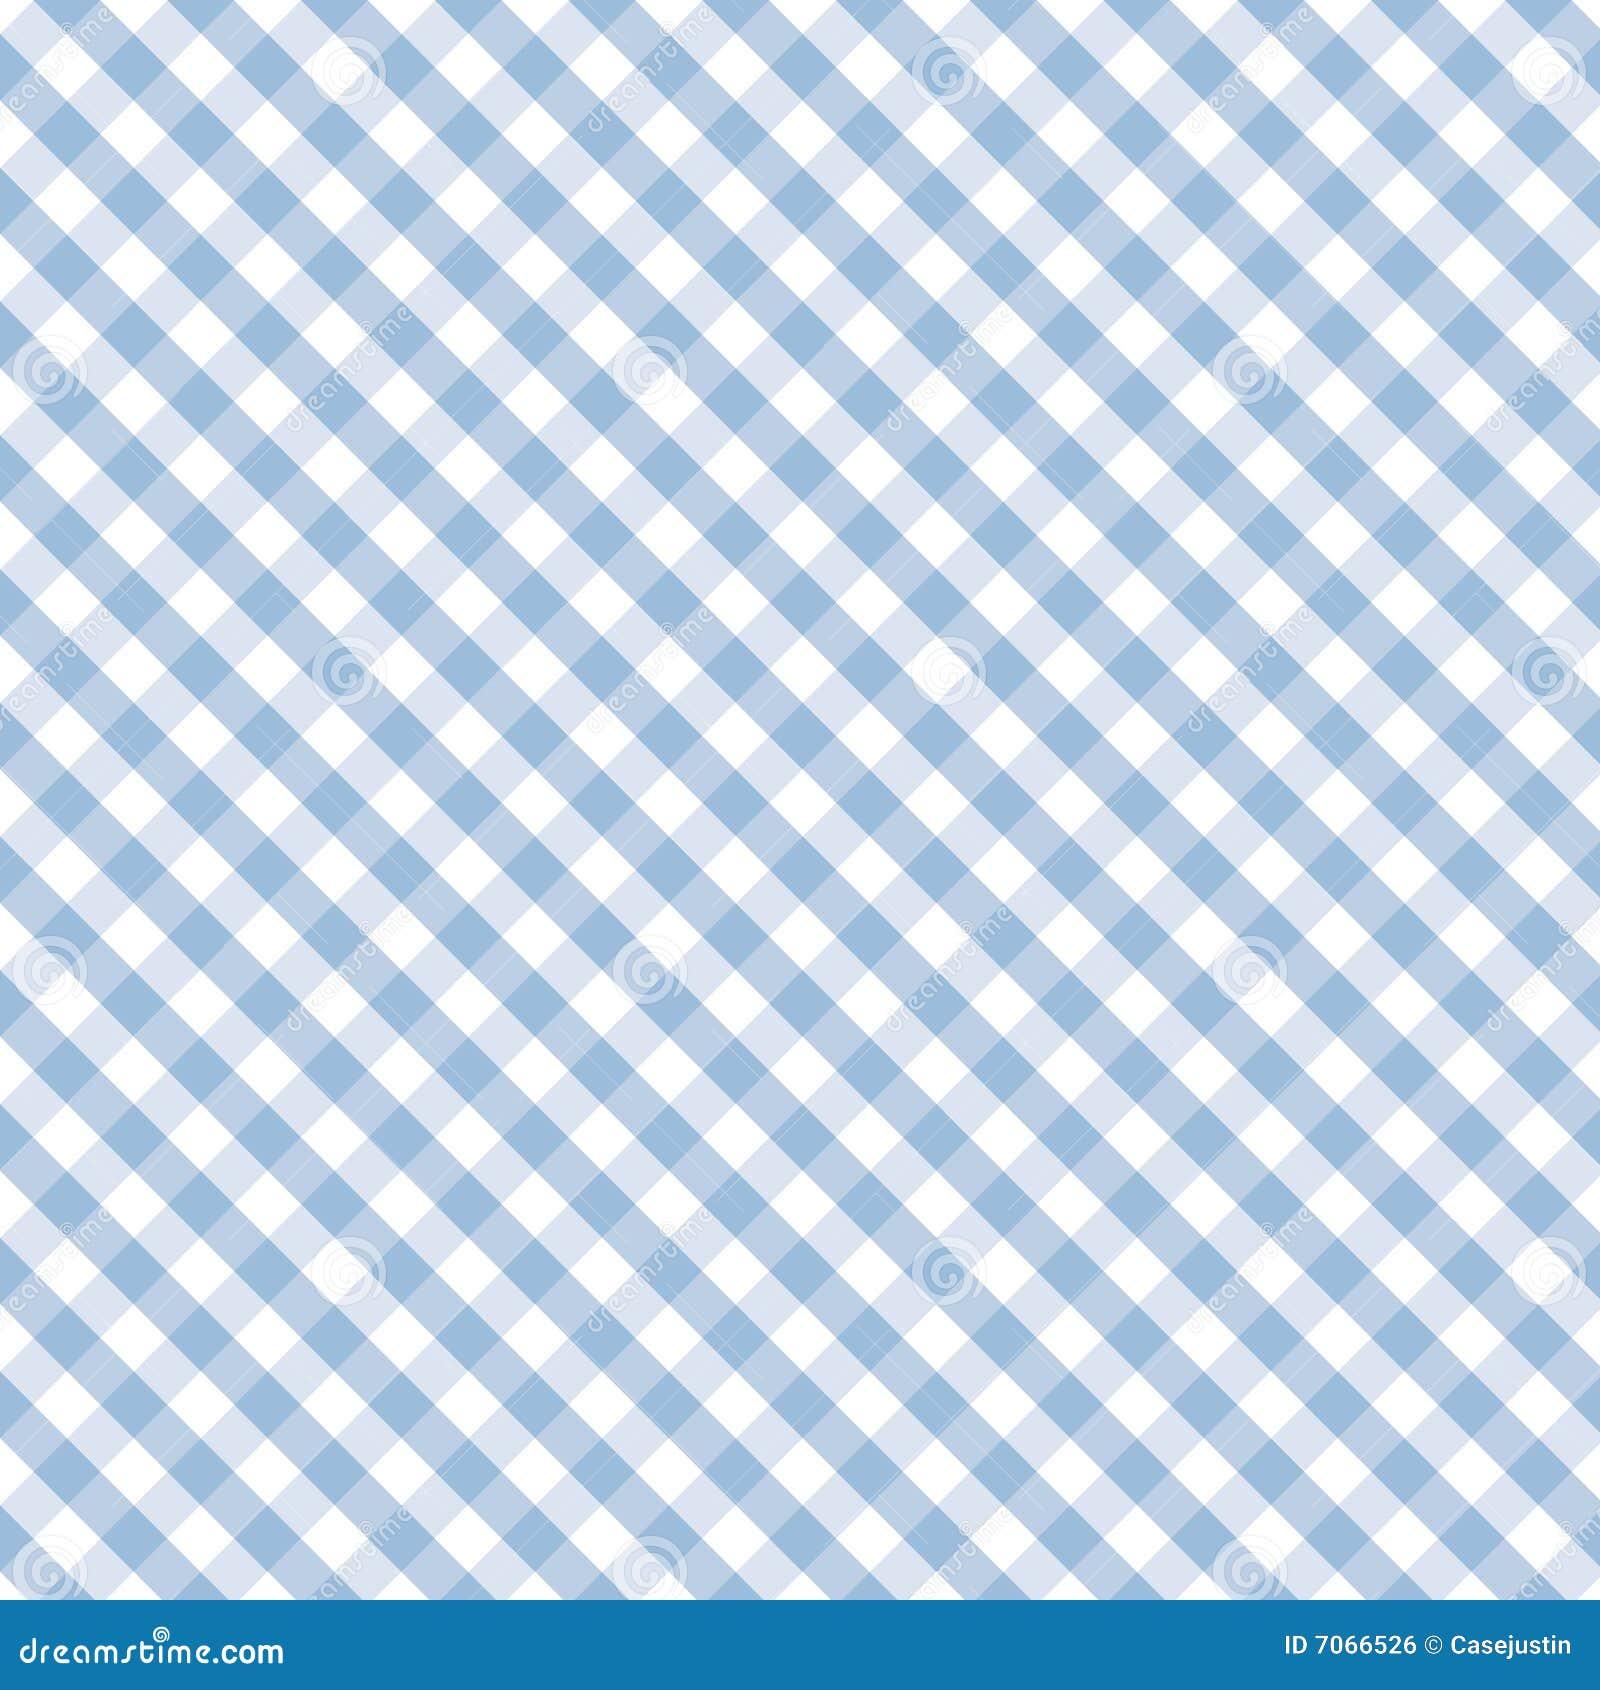 Gingham Cross Weave Pastel Blue Seamless Stock Vector